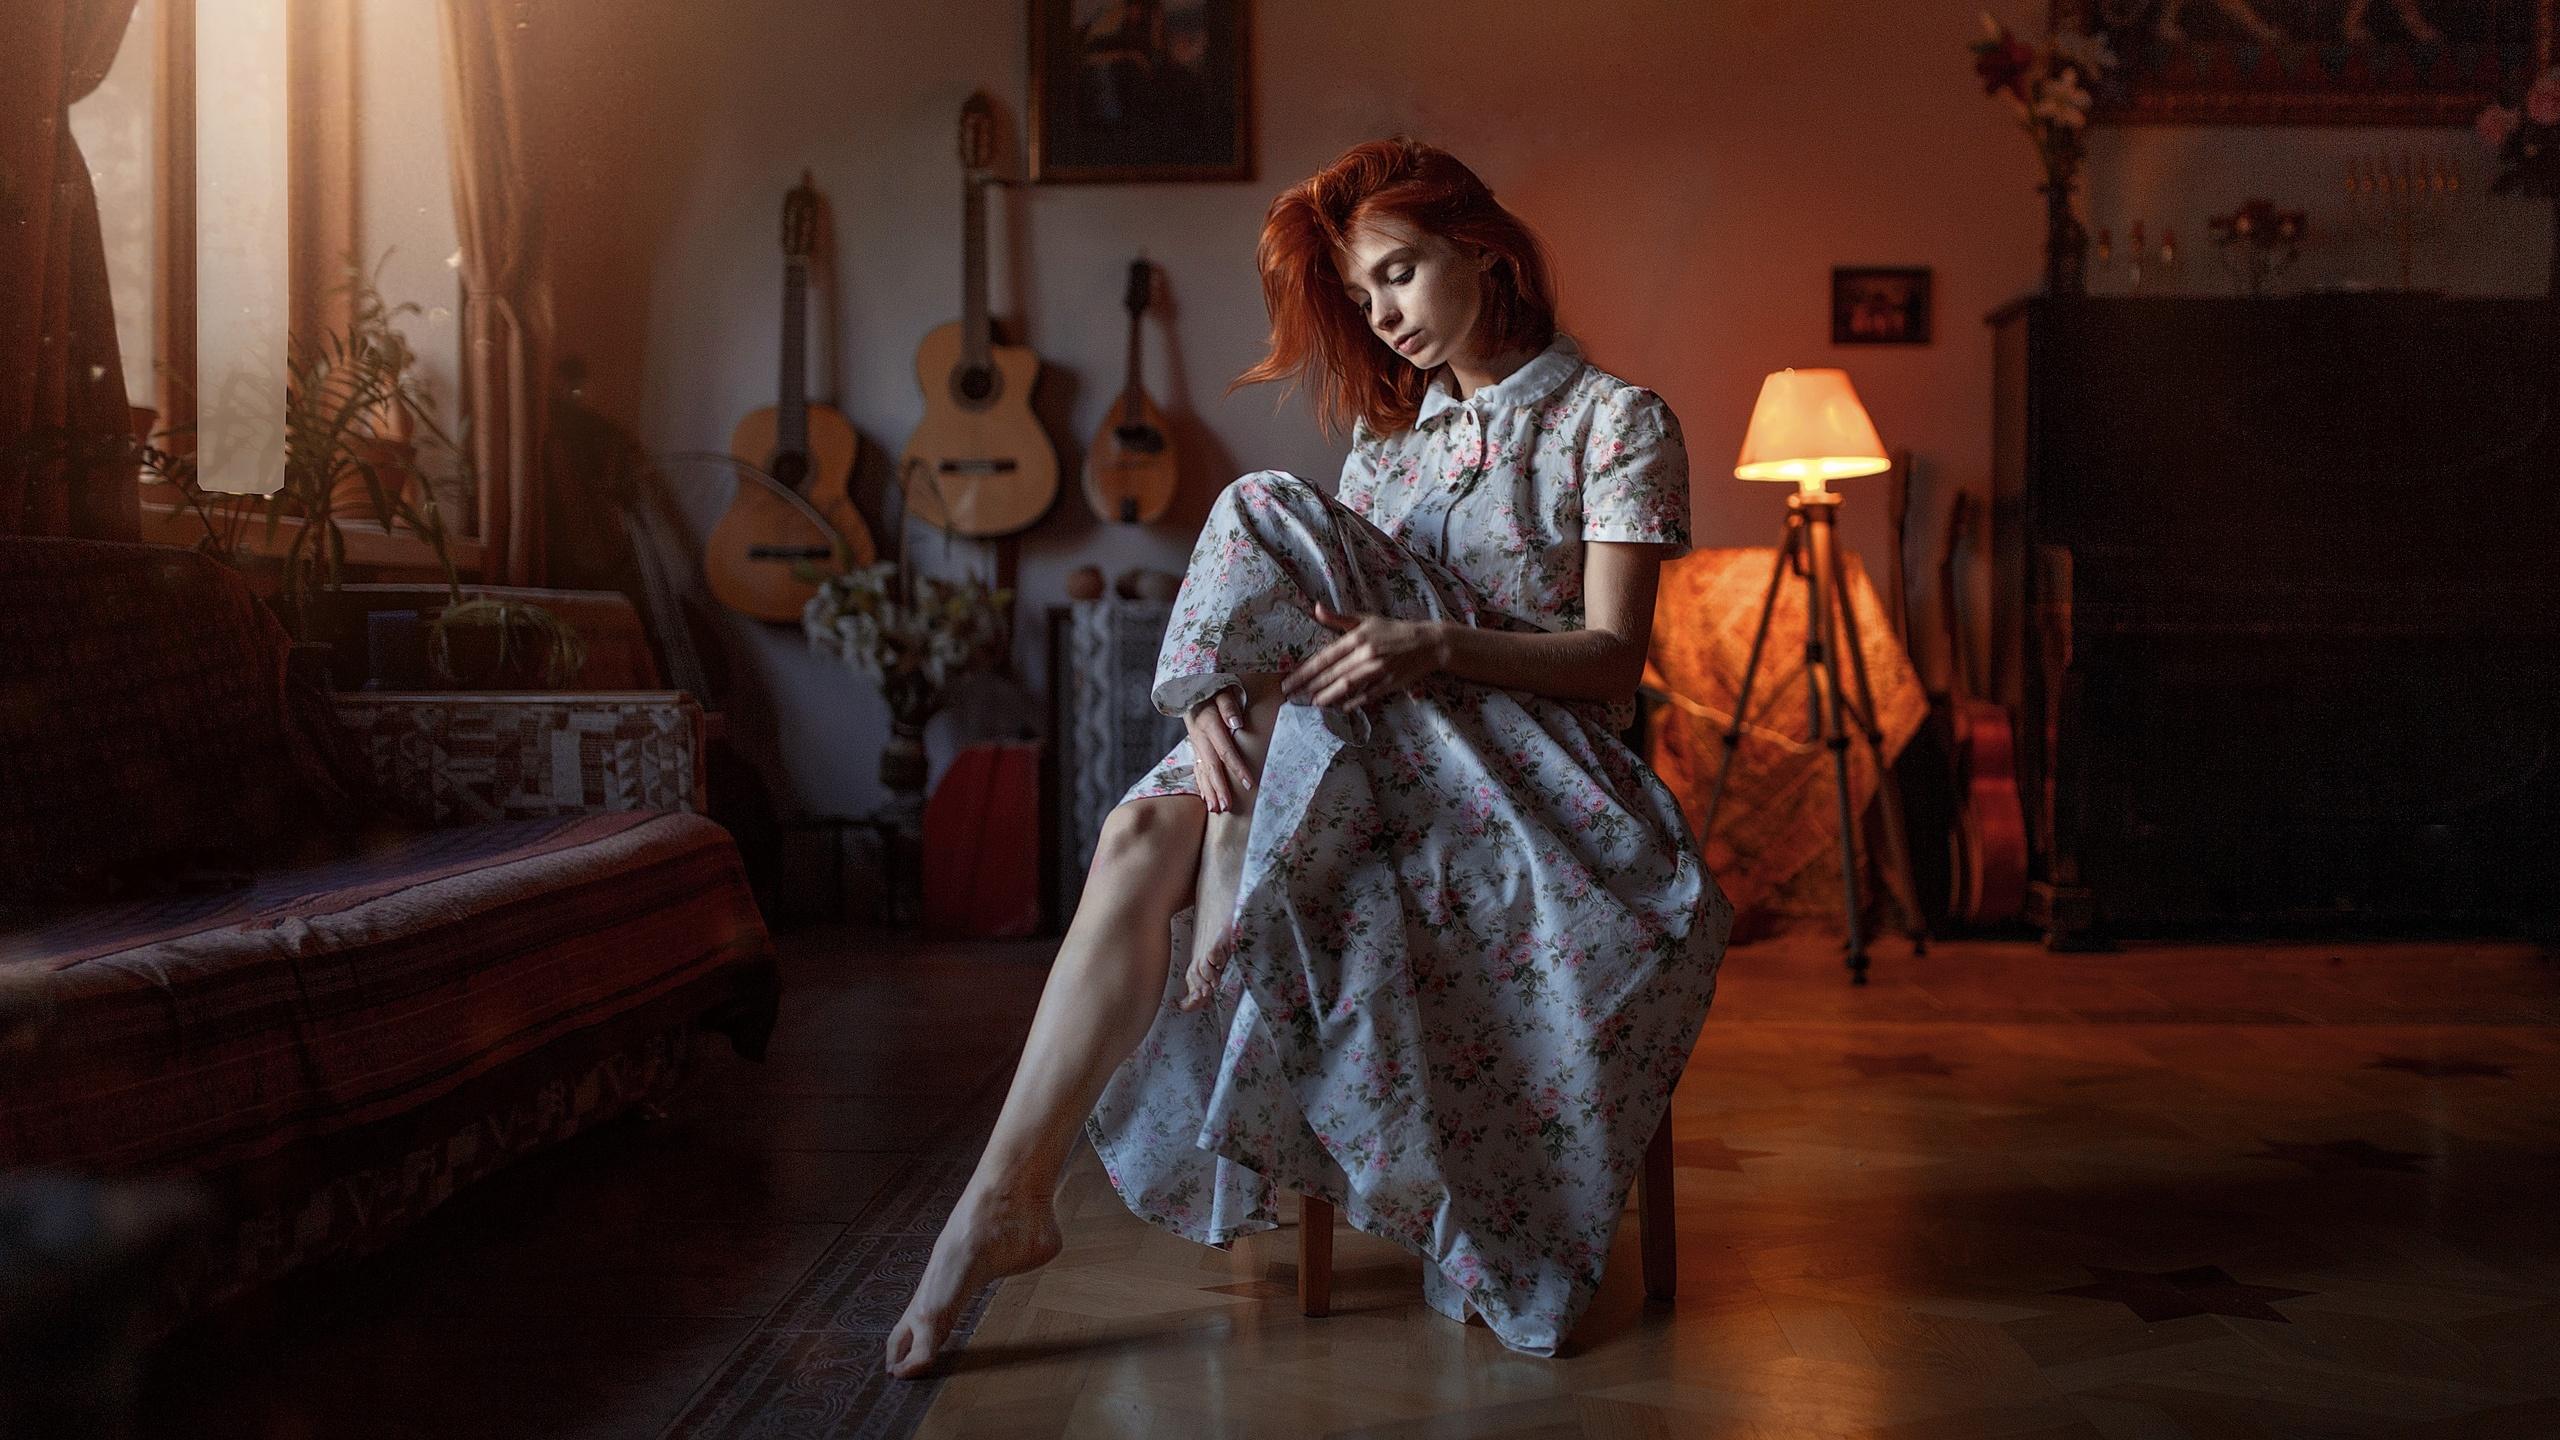 Dress Girl Model Mood Redhead Woman 2560x1440